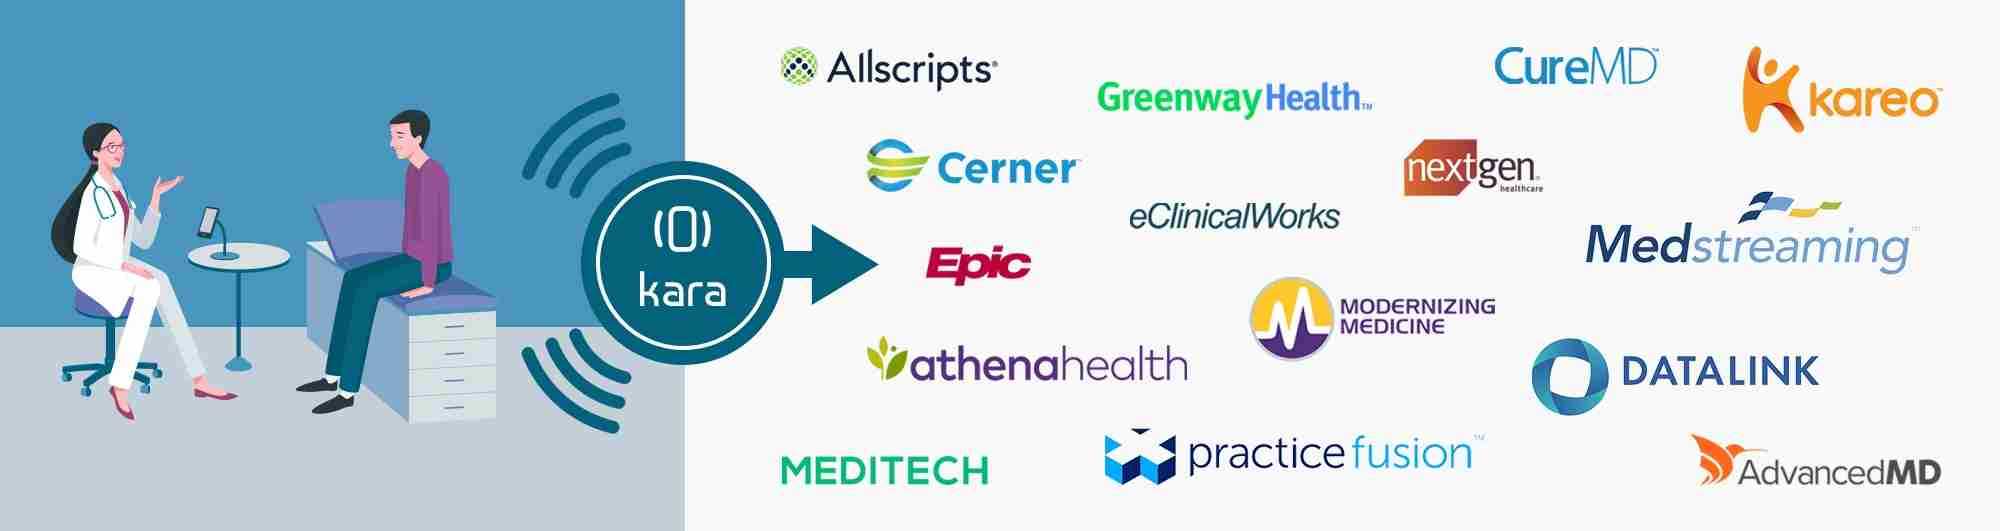 Nuance-Acquires-Ambient-AI-Assistant-for-Physicians-Platform-Saykara